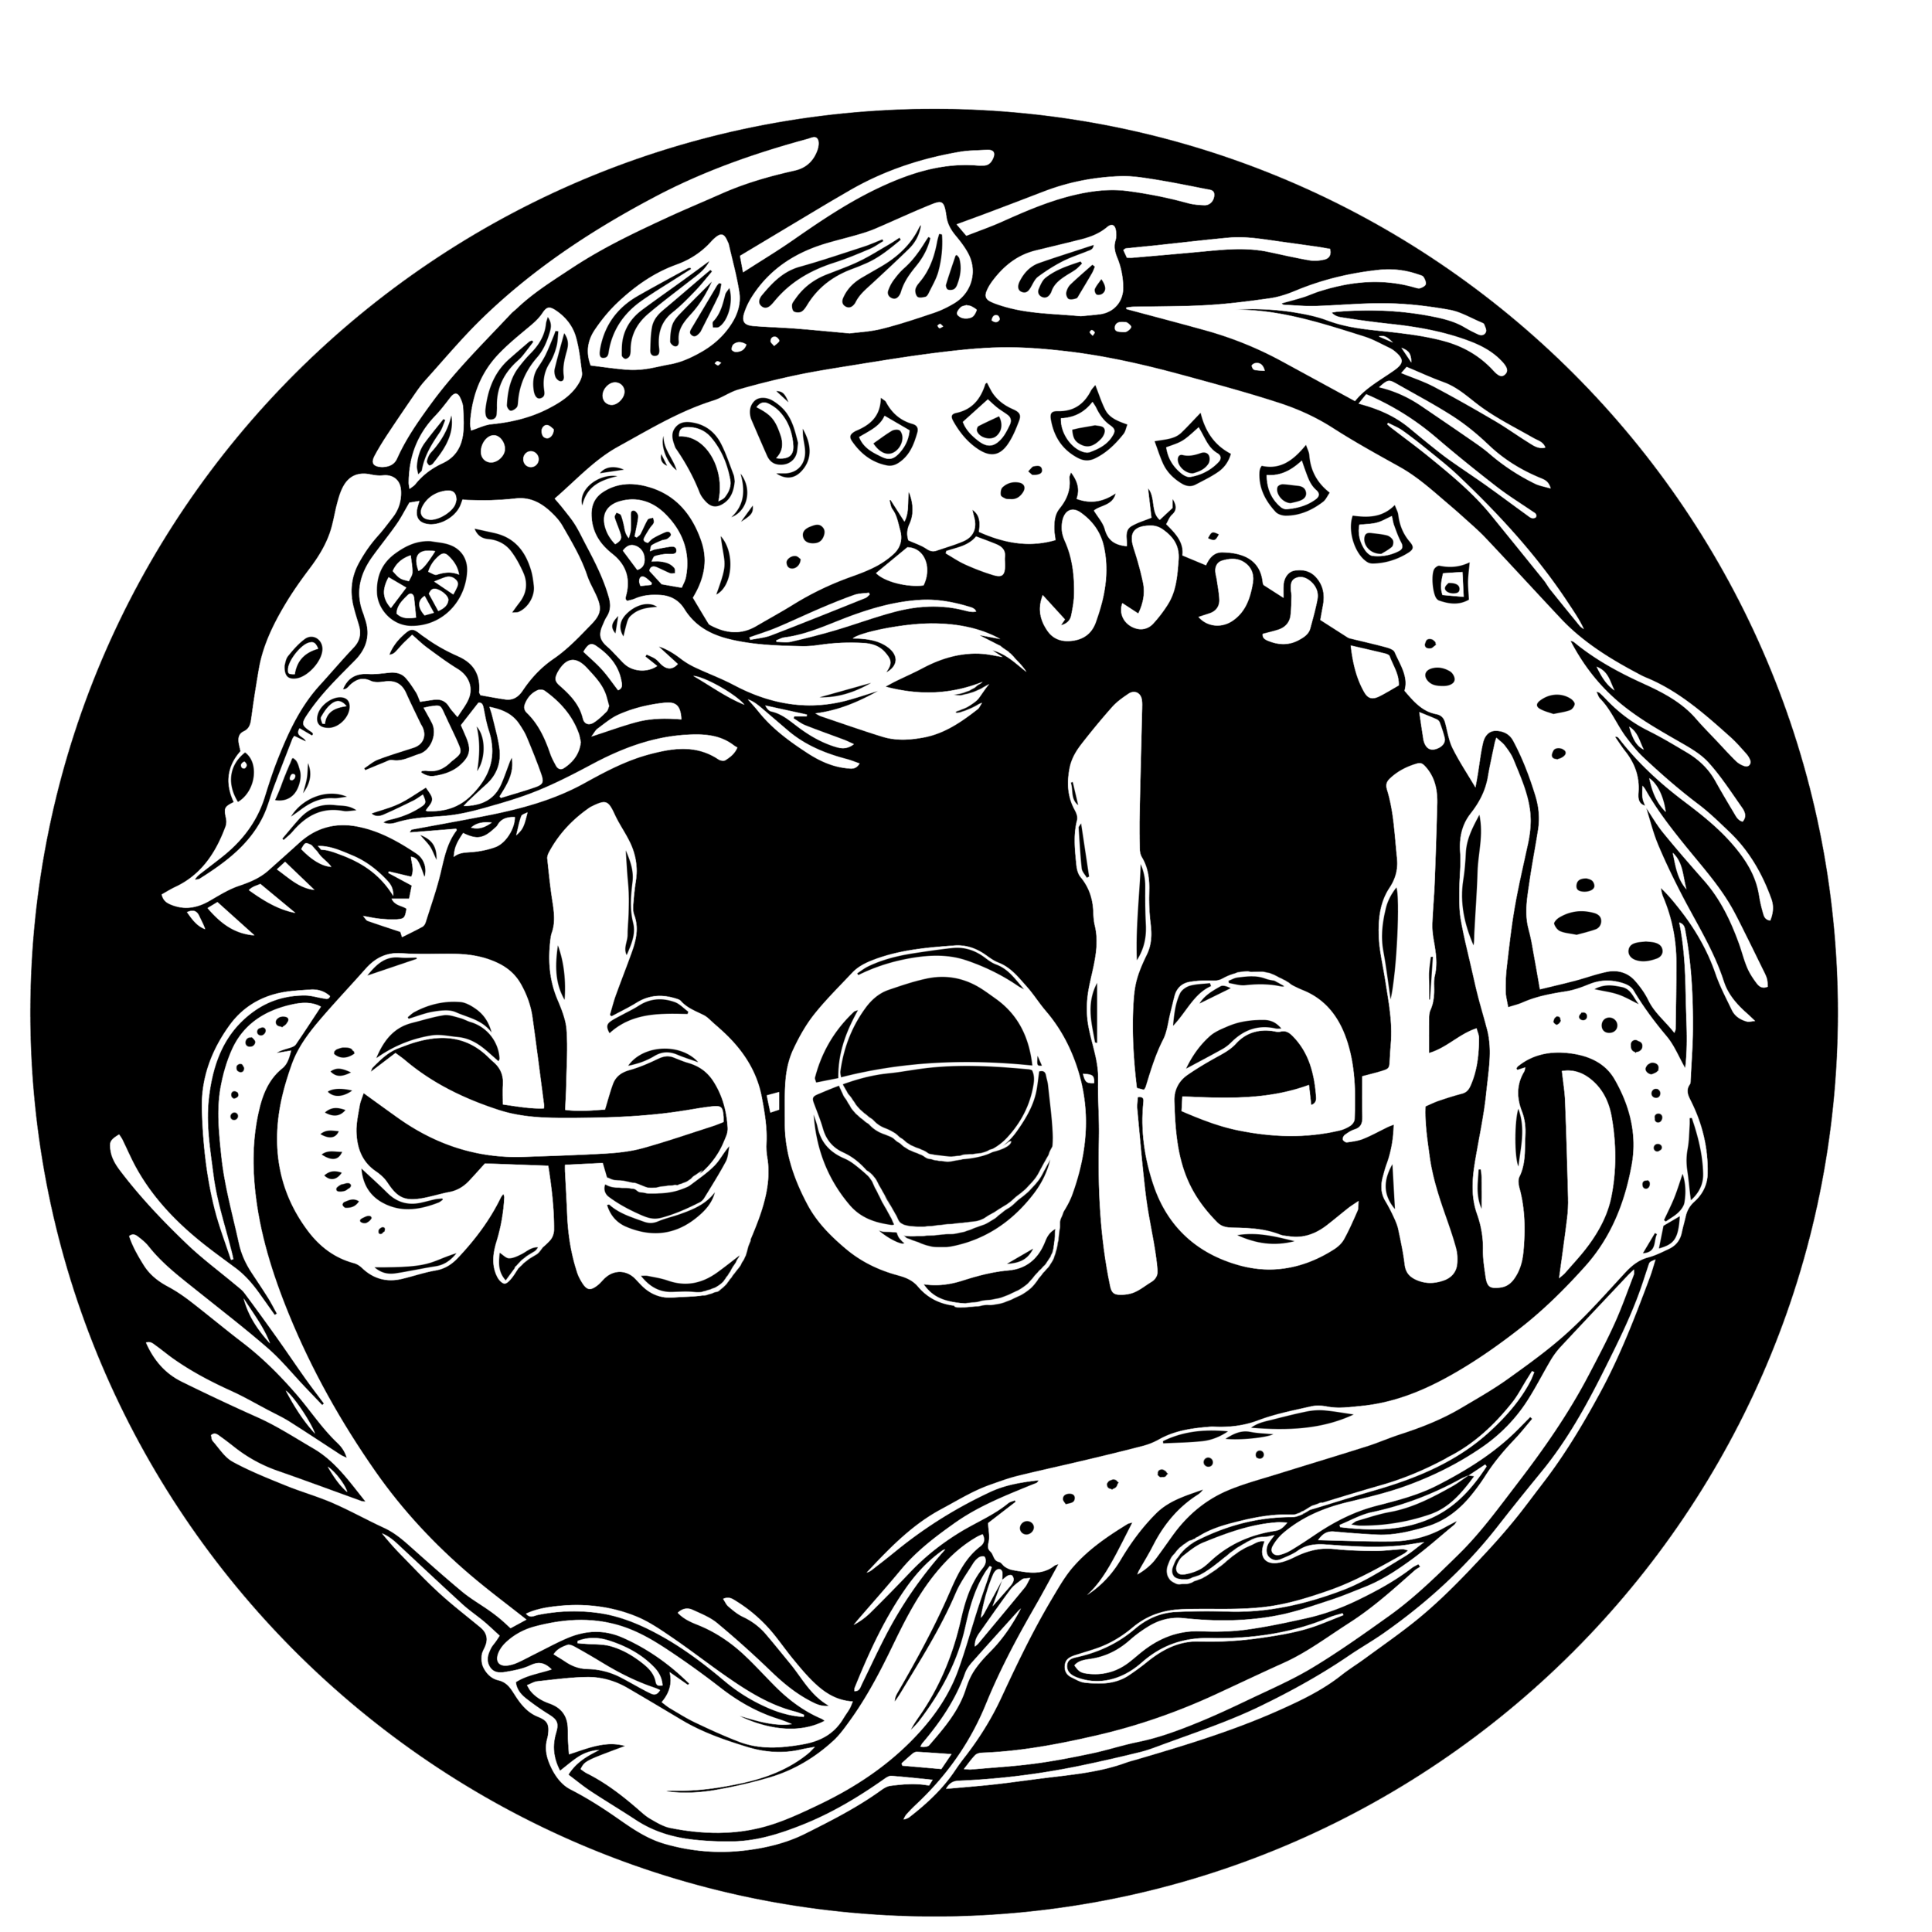 aboleth+new+logo+hi+res+circle.png